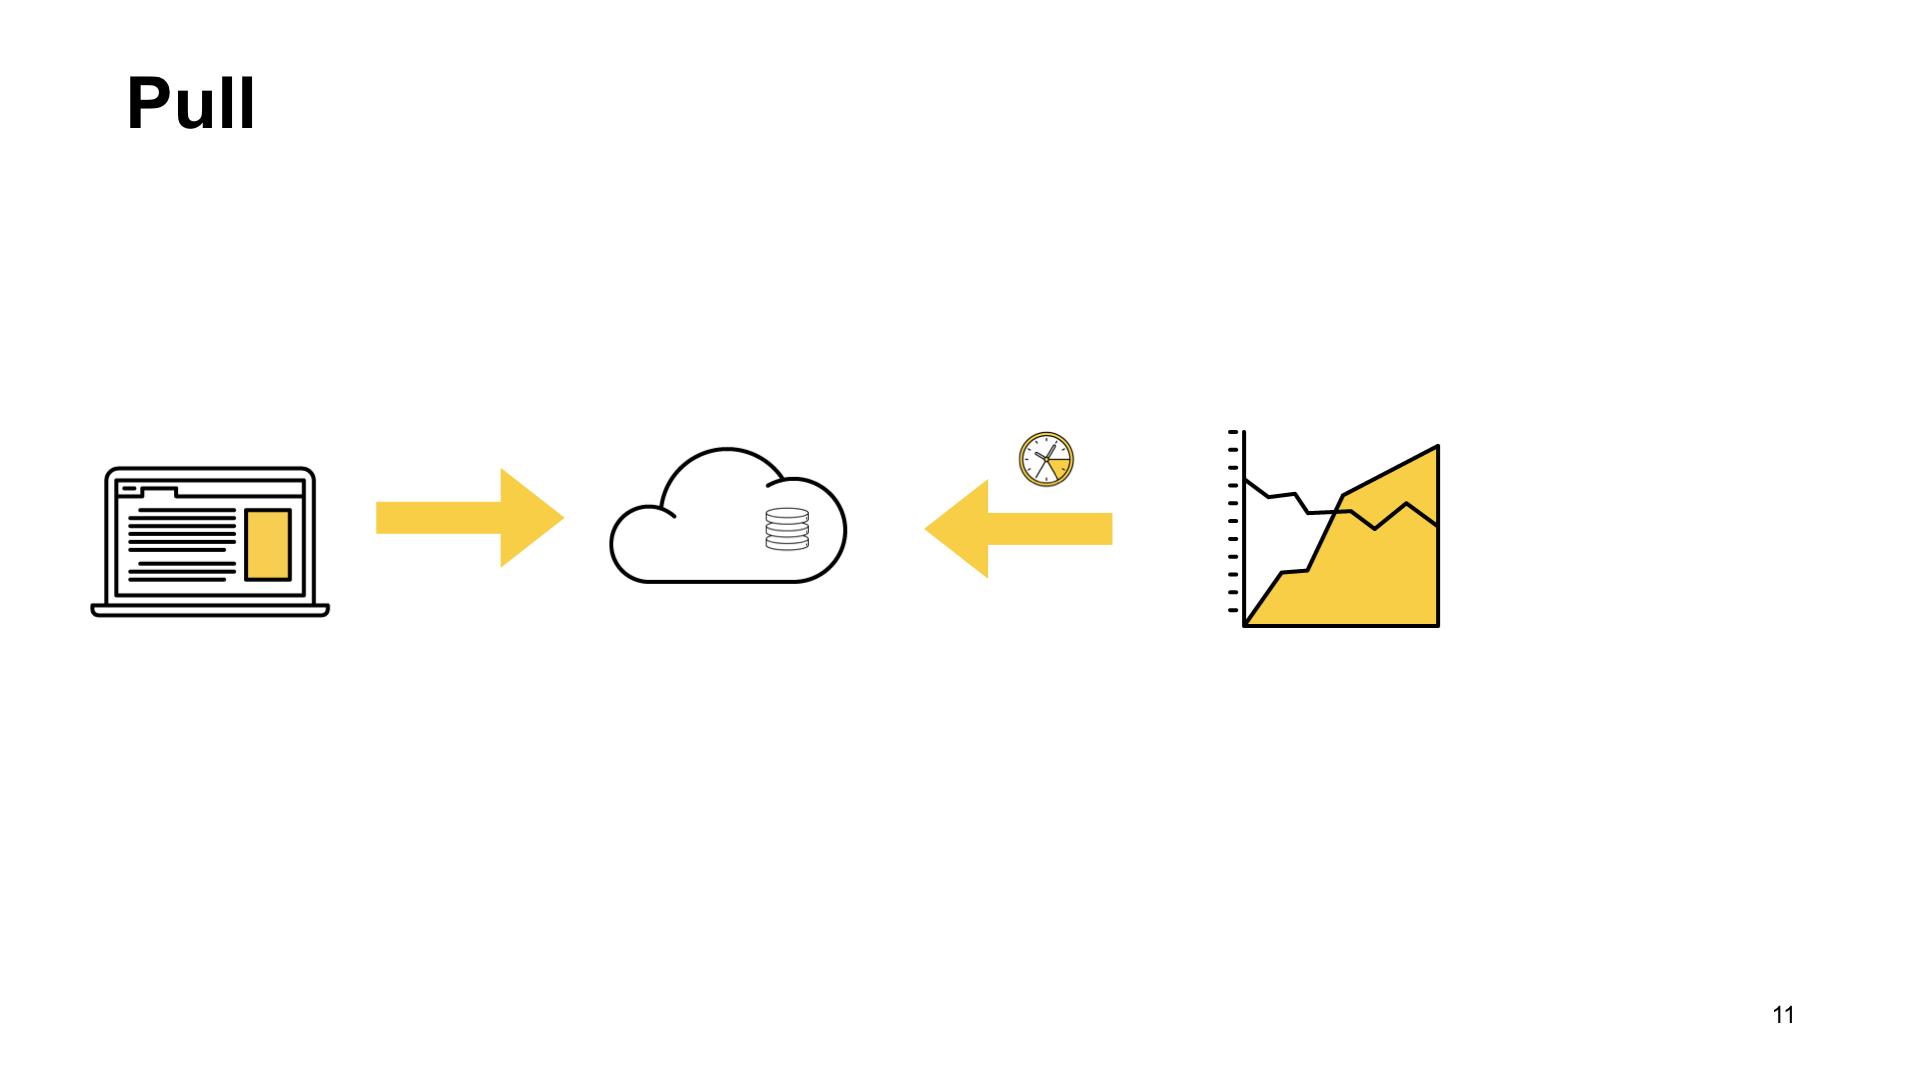 uWSGI в помощь метрикам. Доклад Яндекса - 6